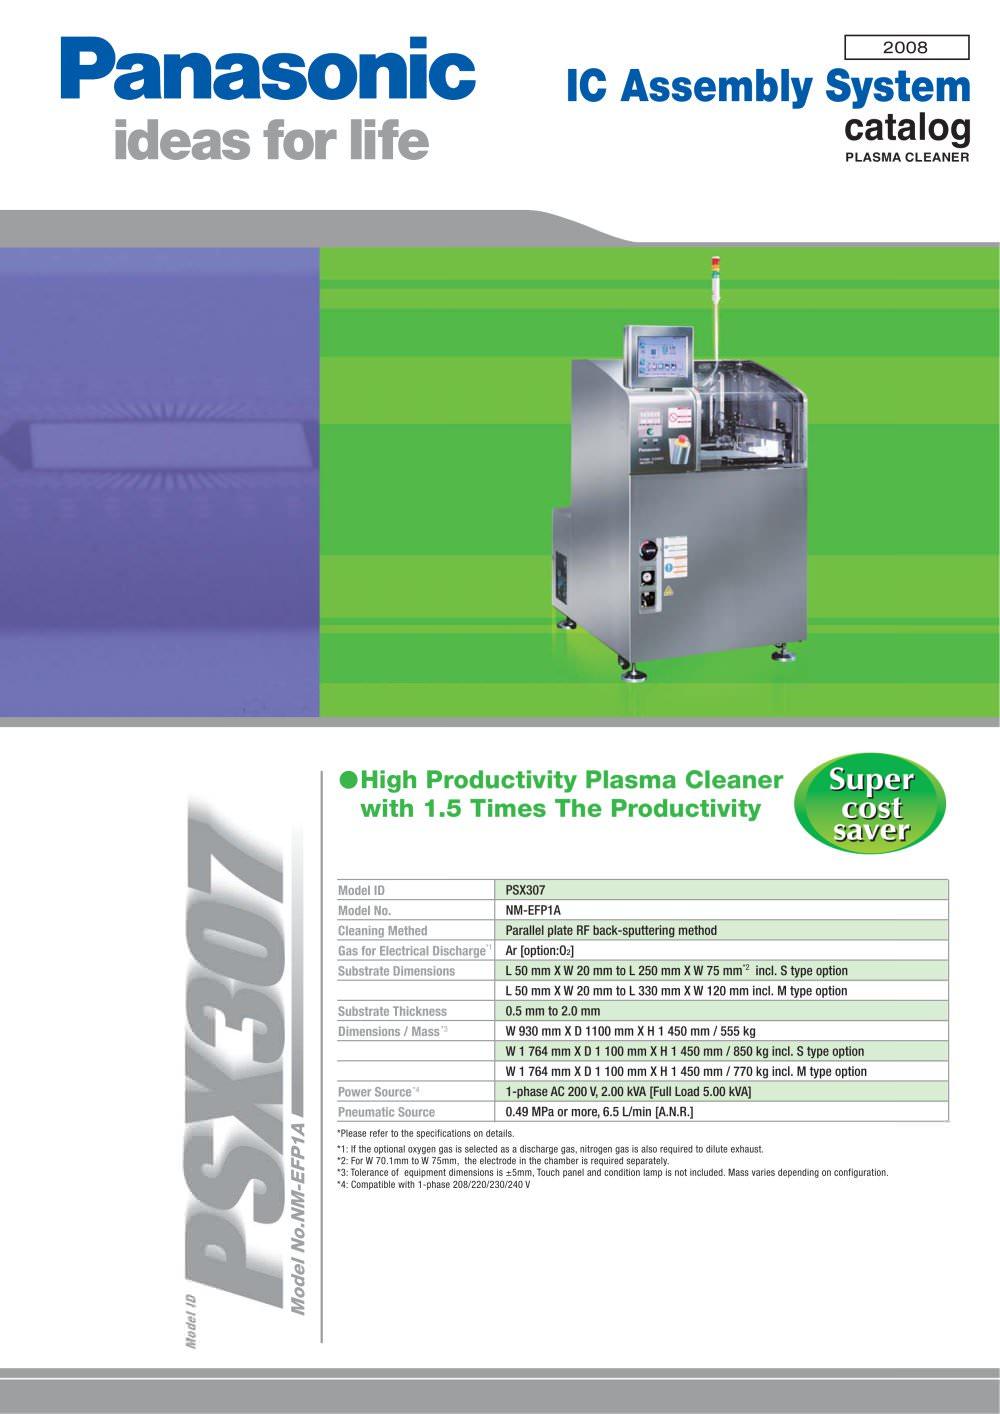 Plasma Cleaner Psx307 Panasonic Factory Automation Company Pdf Washing Machine Wiring Diagram 1 2 Pages